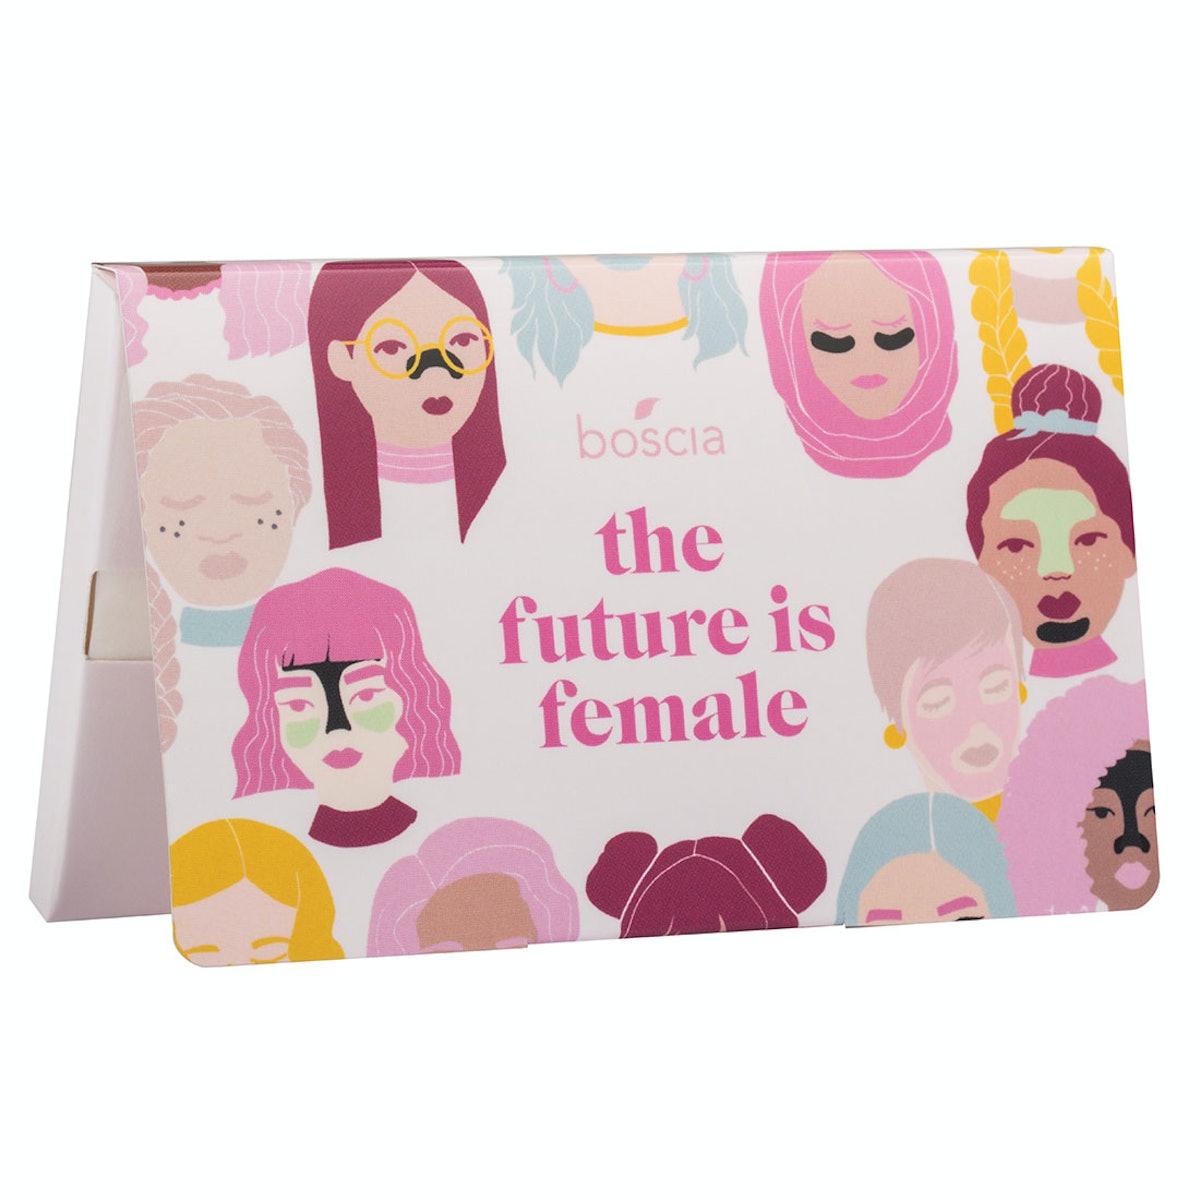 Boscia The Future is Female: Peppermint Blotting Linens